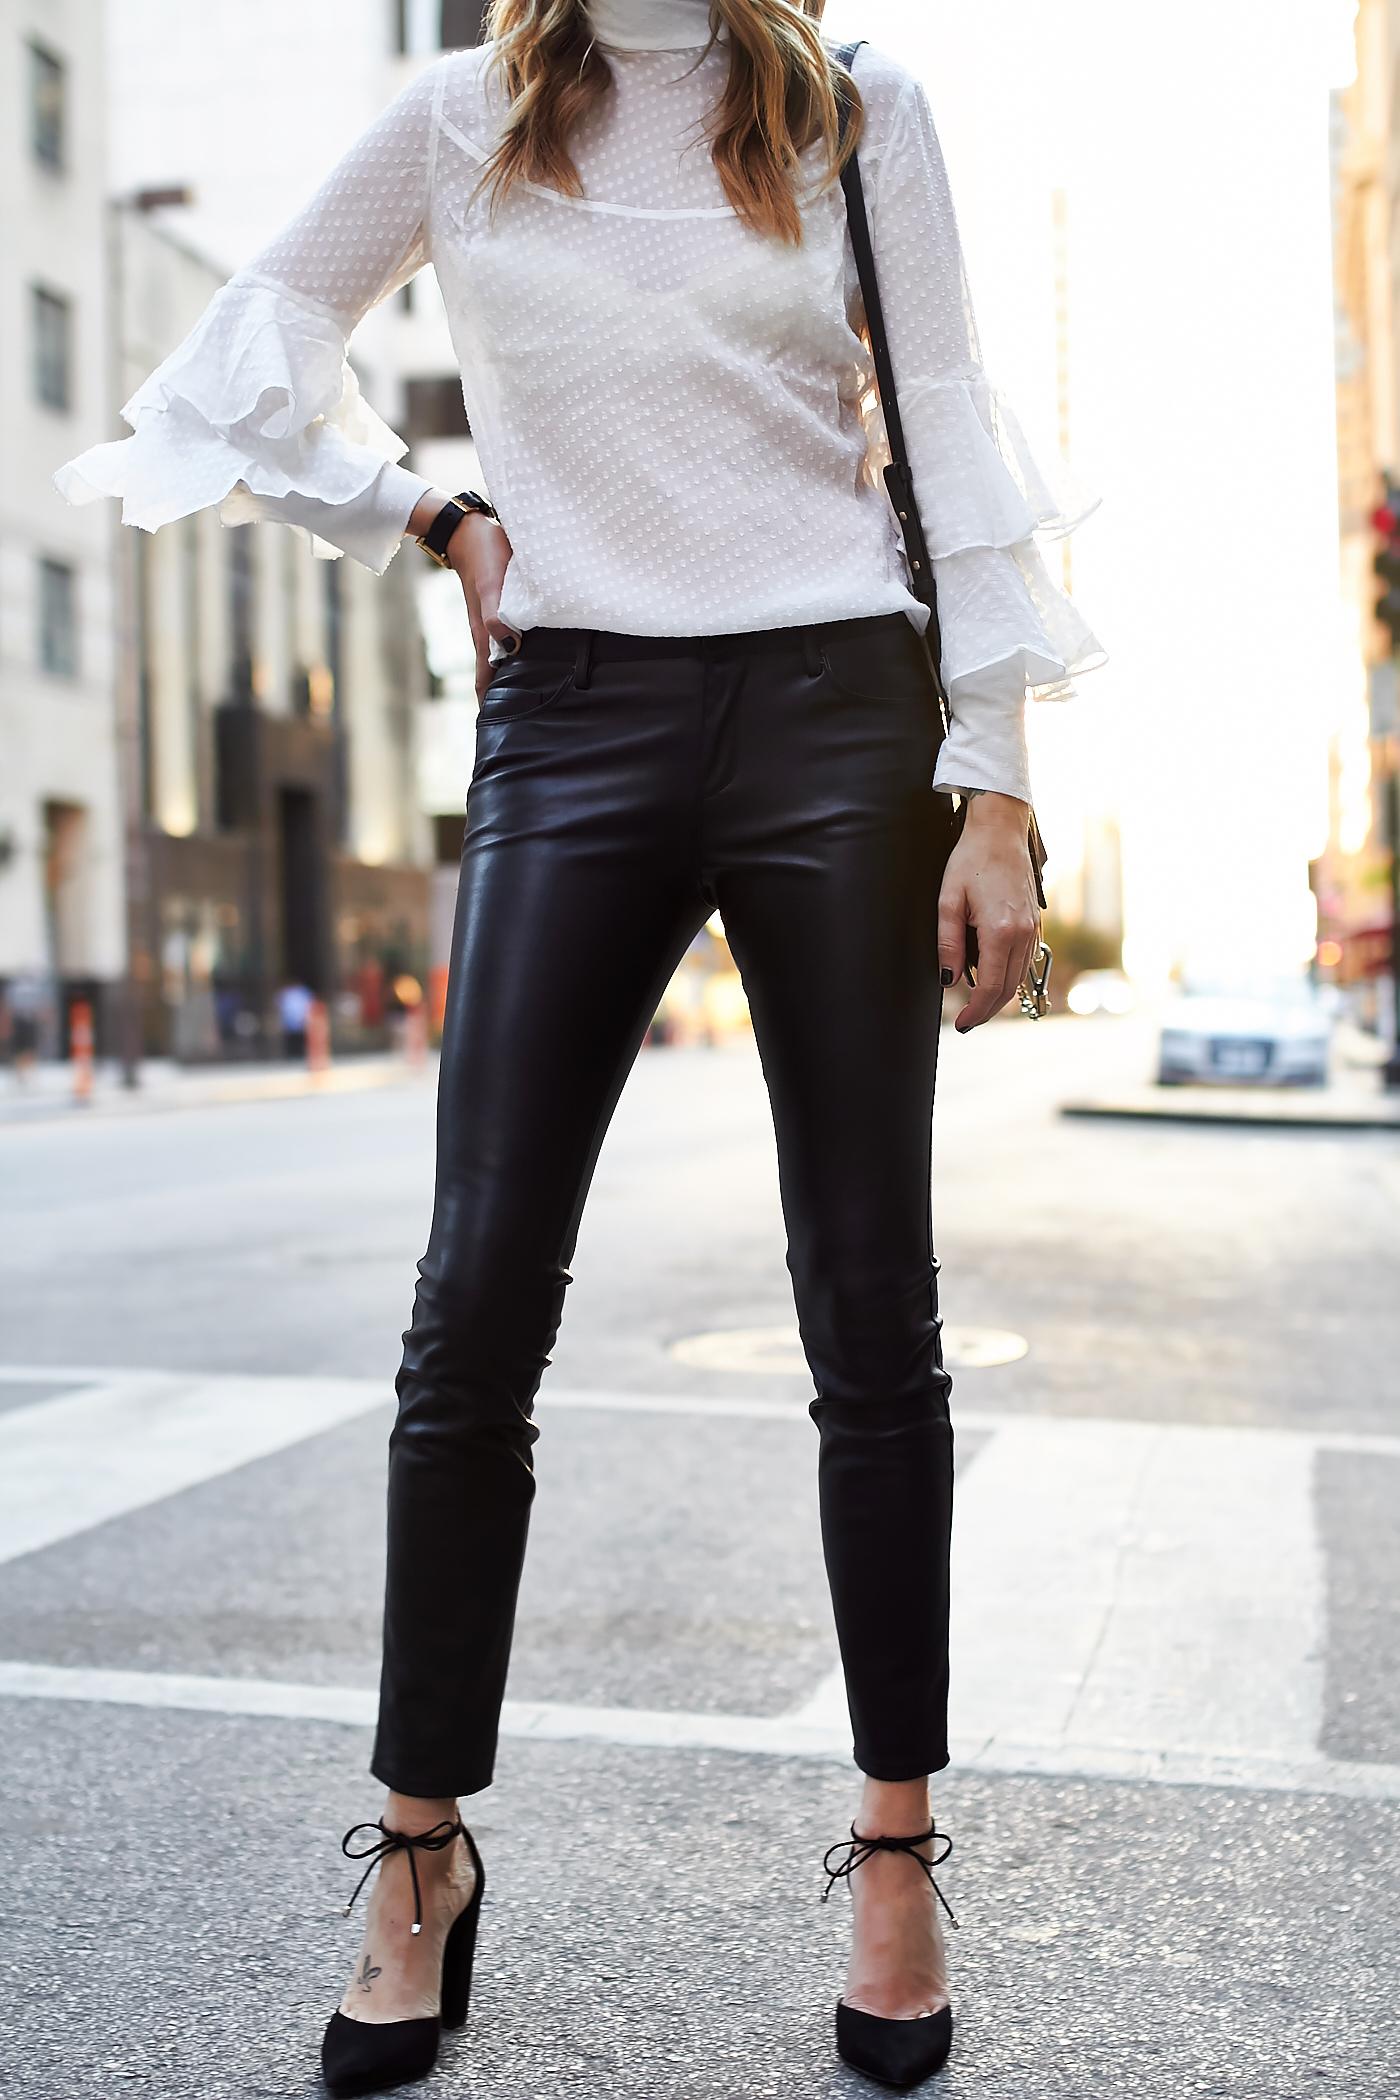 fashion-jackson-olivia-palermo-chelsea28-tiered-sleeve-blouse-black-faux-leather-skinny-pants-black-bow-pumps